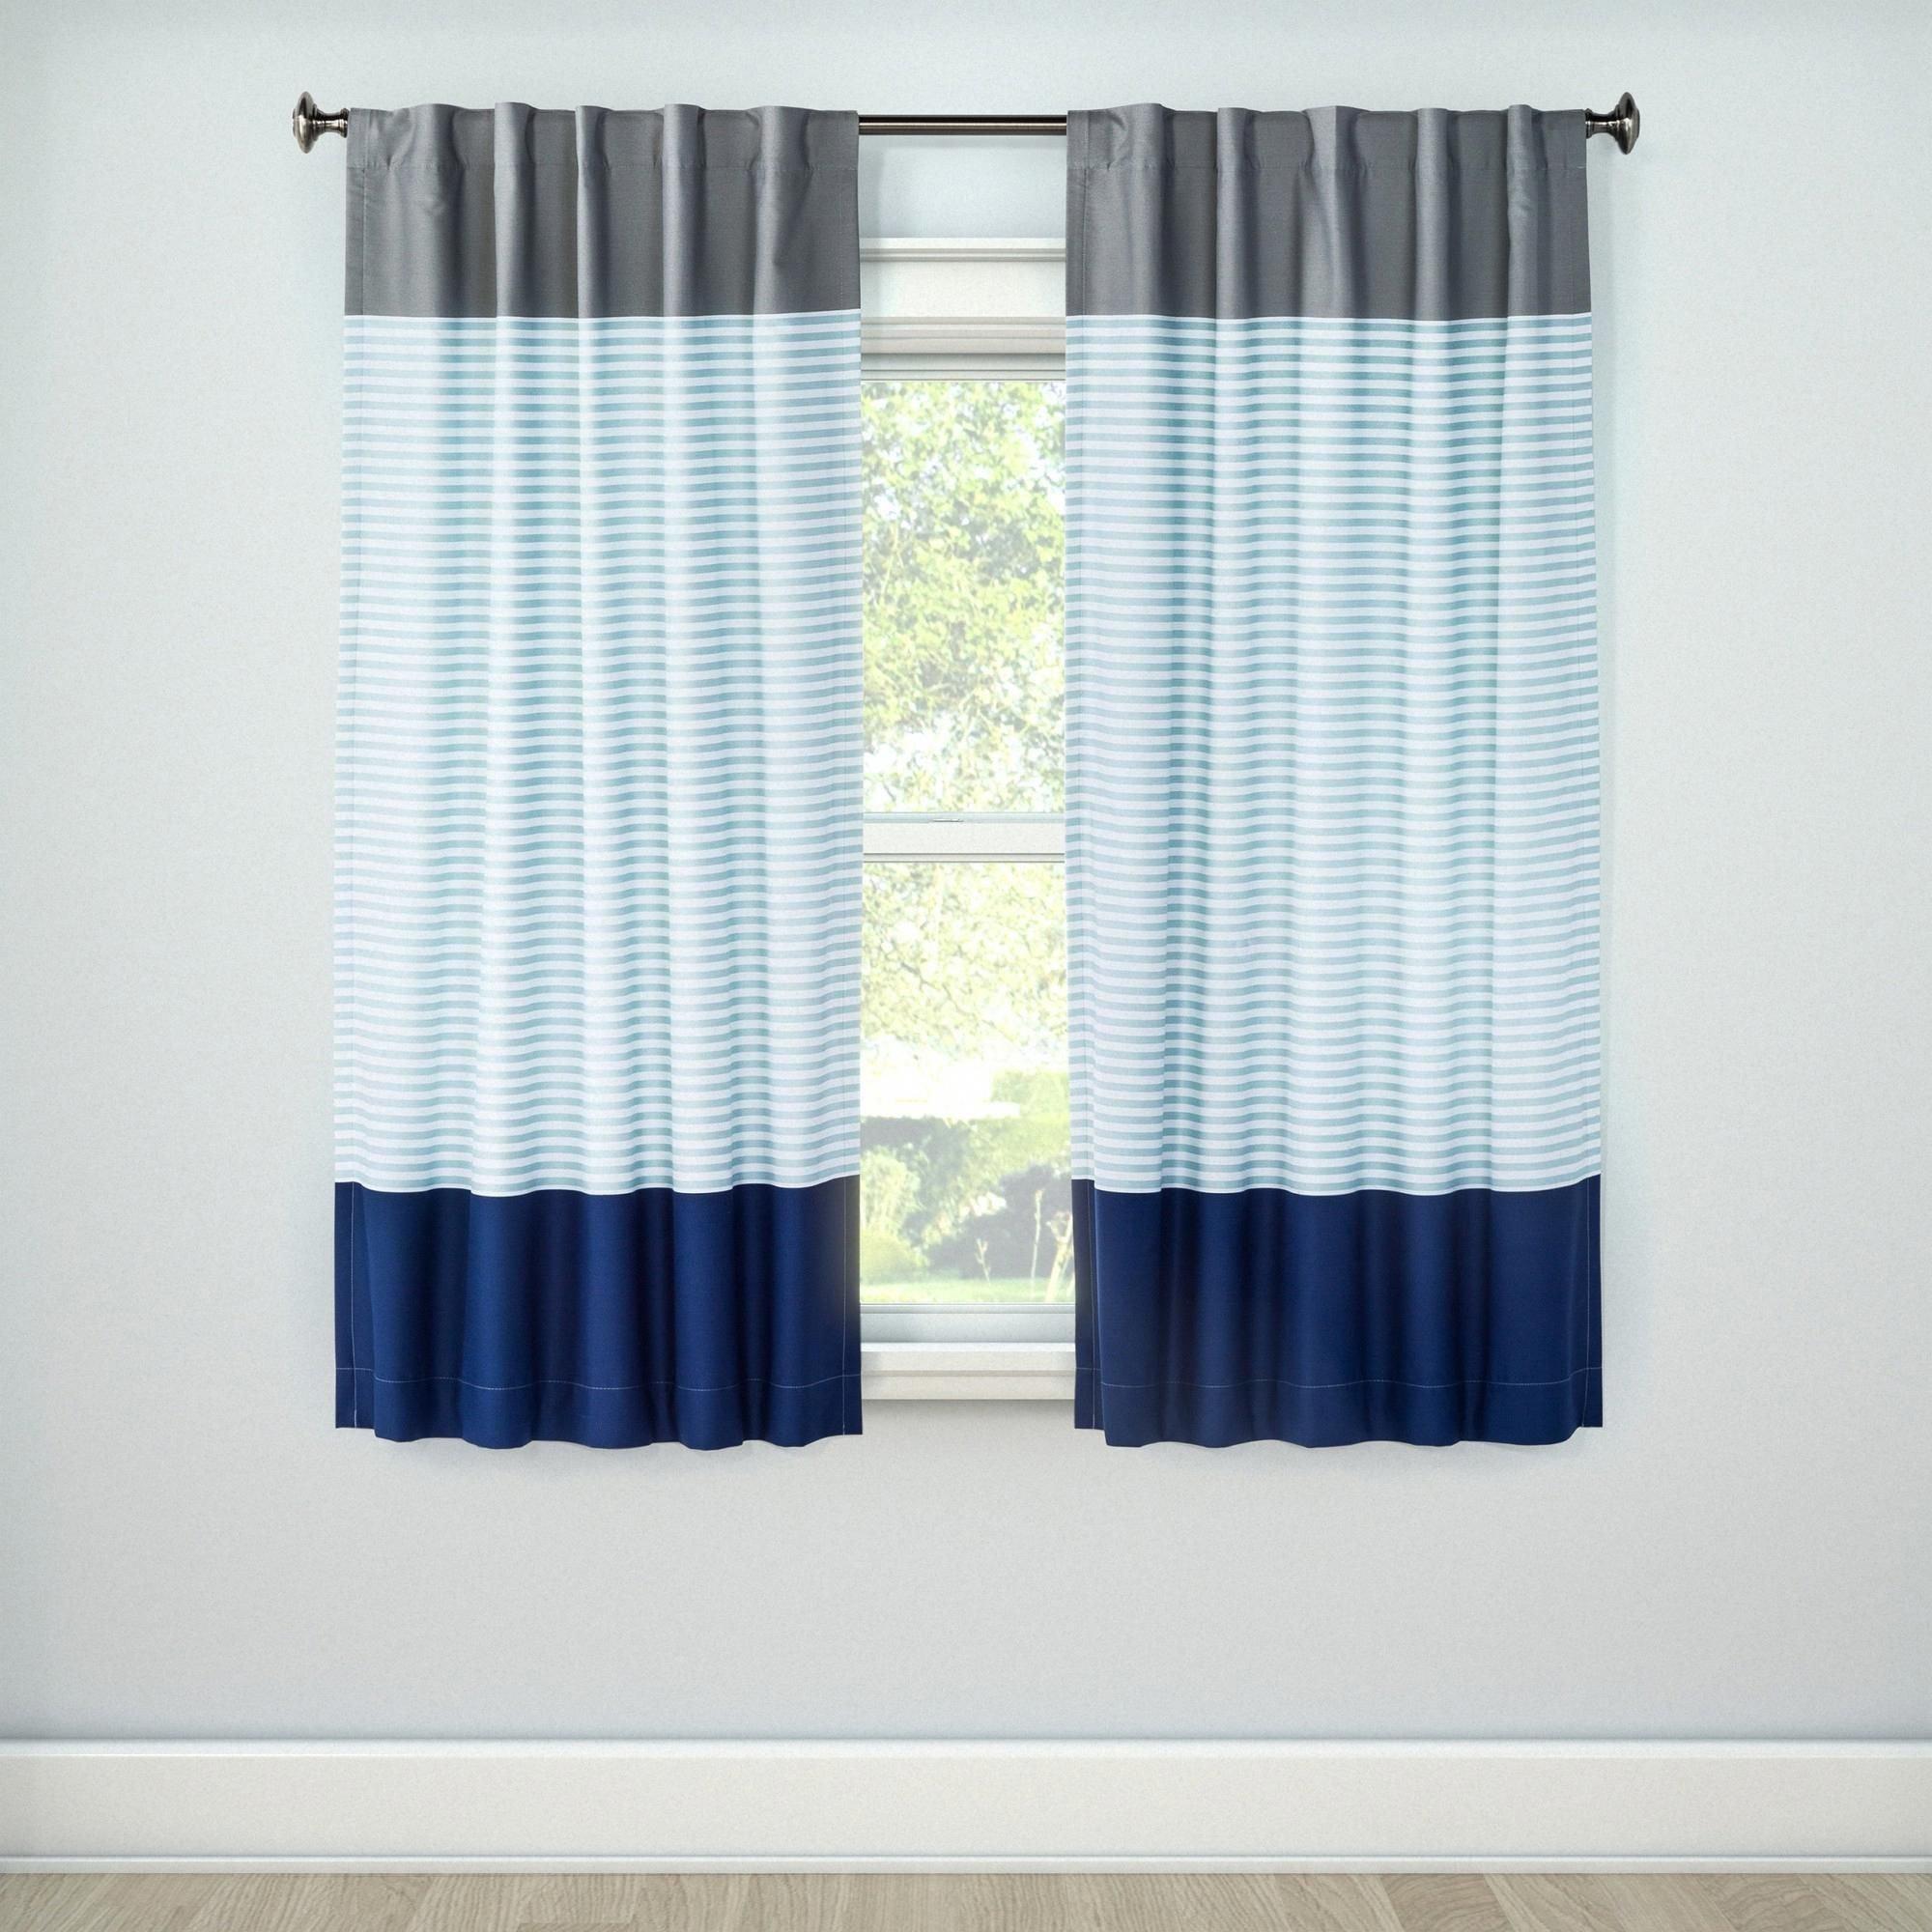 "Short Curtains for Bedroom Elegant Colorblock Light Blocking Window Curtain 84""x42"" Blue"